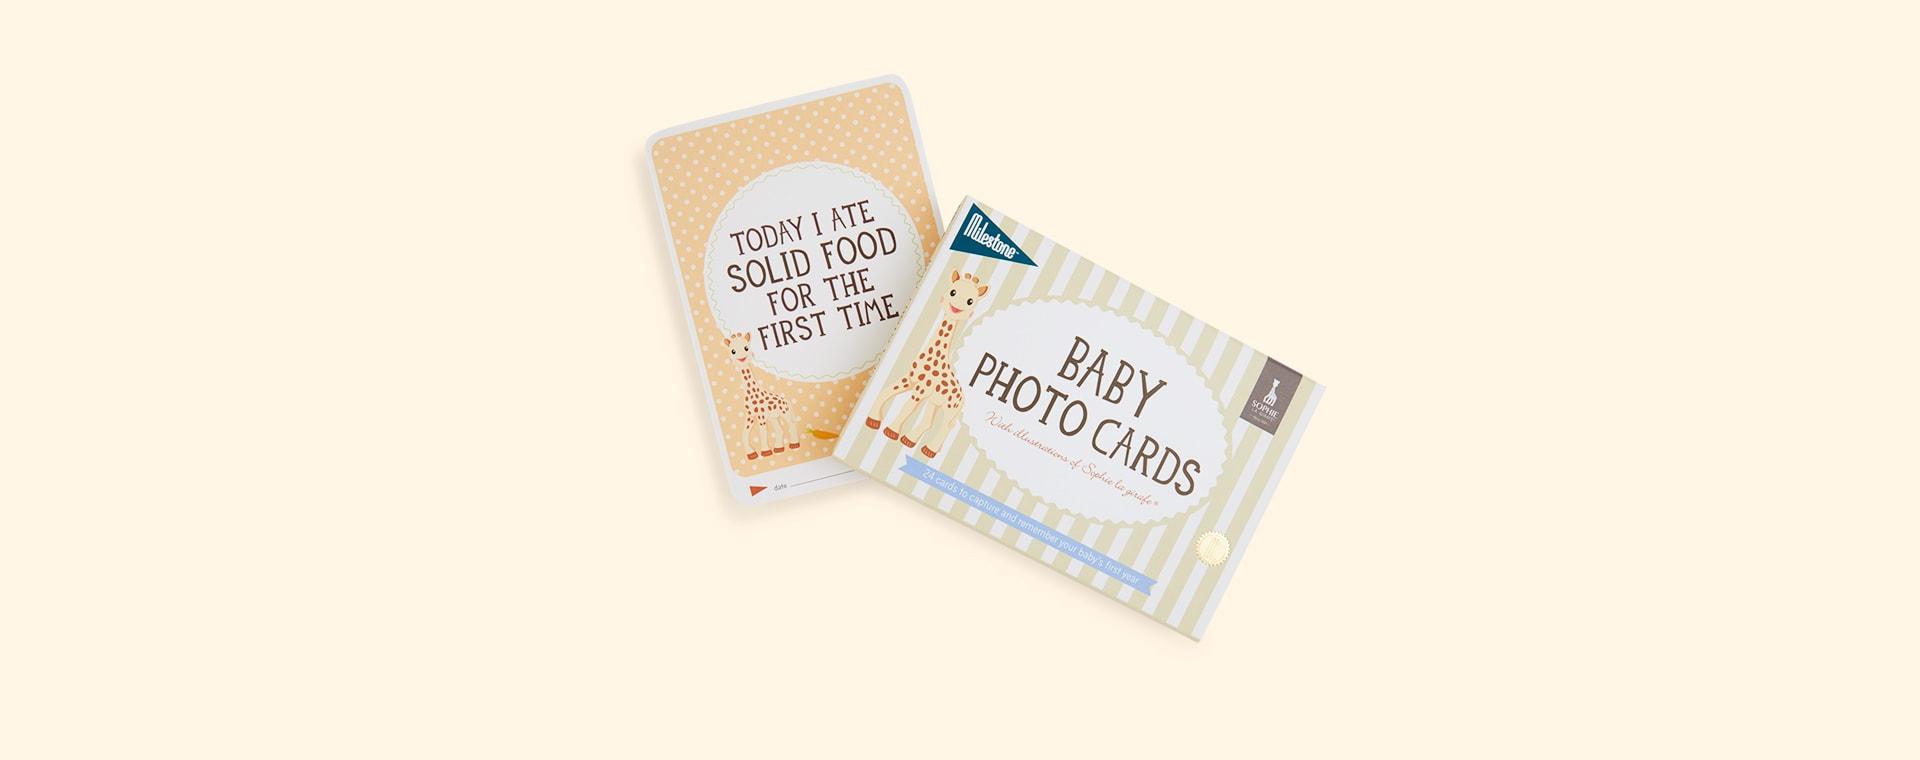 Neutral Milestone Sophie la girafe Baby Cards